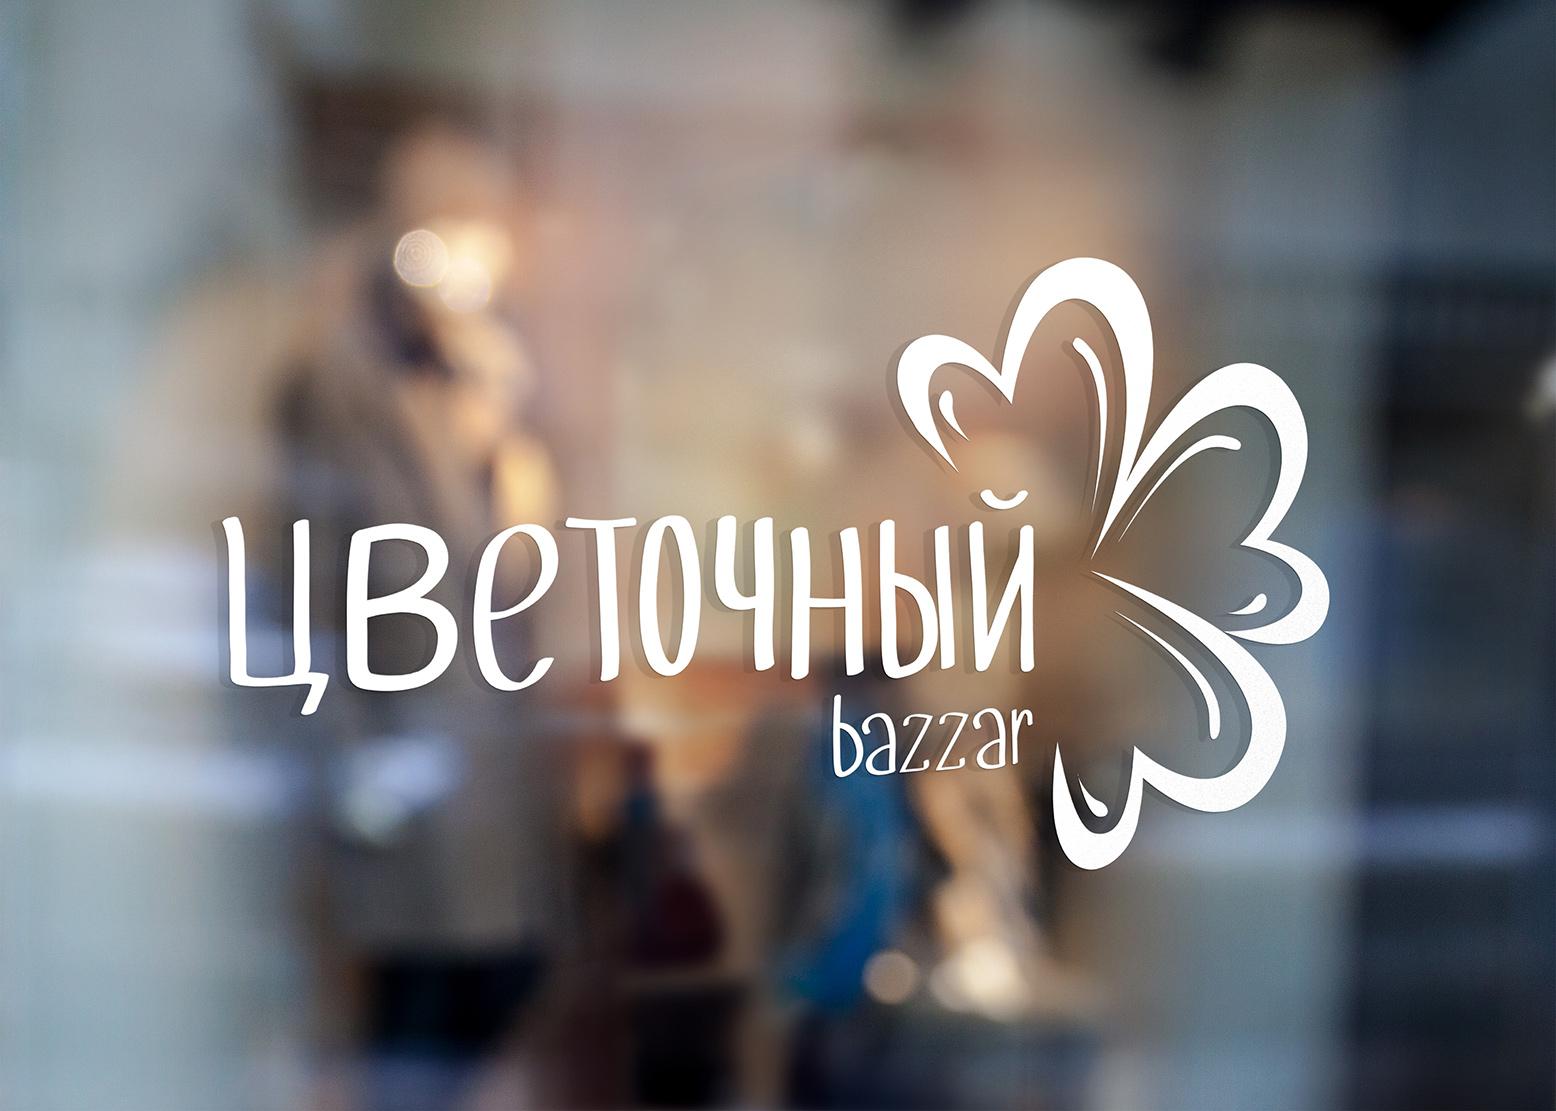 Разработка фирменного стиля для цветочного салона фото f_9295c37790874edf.jpg